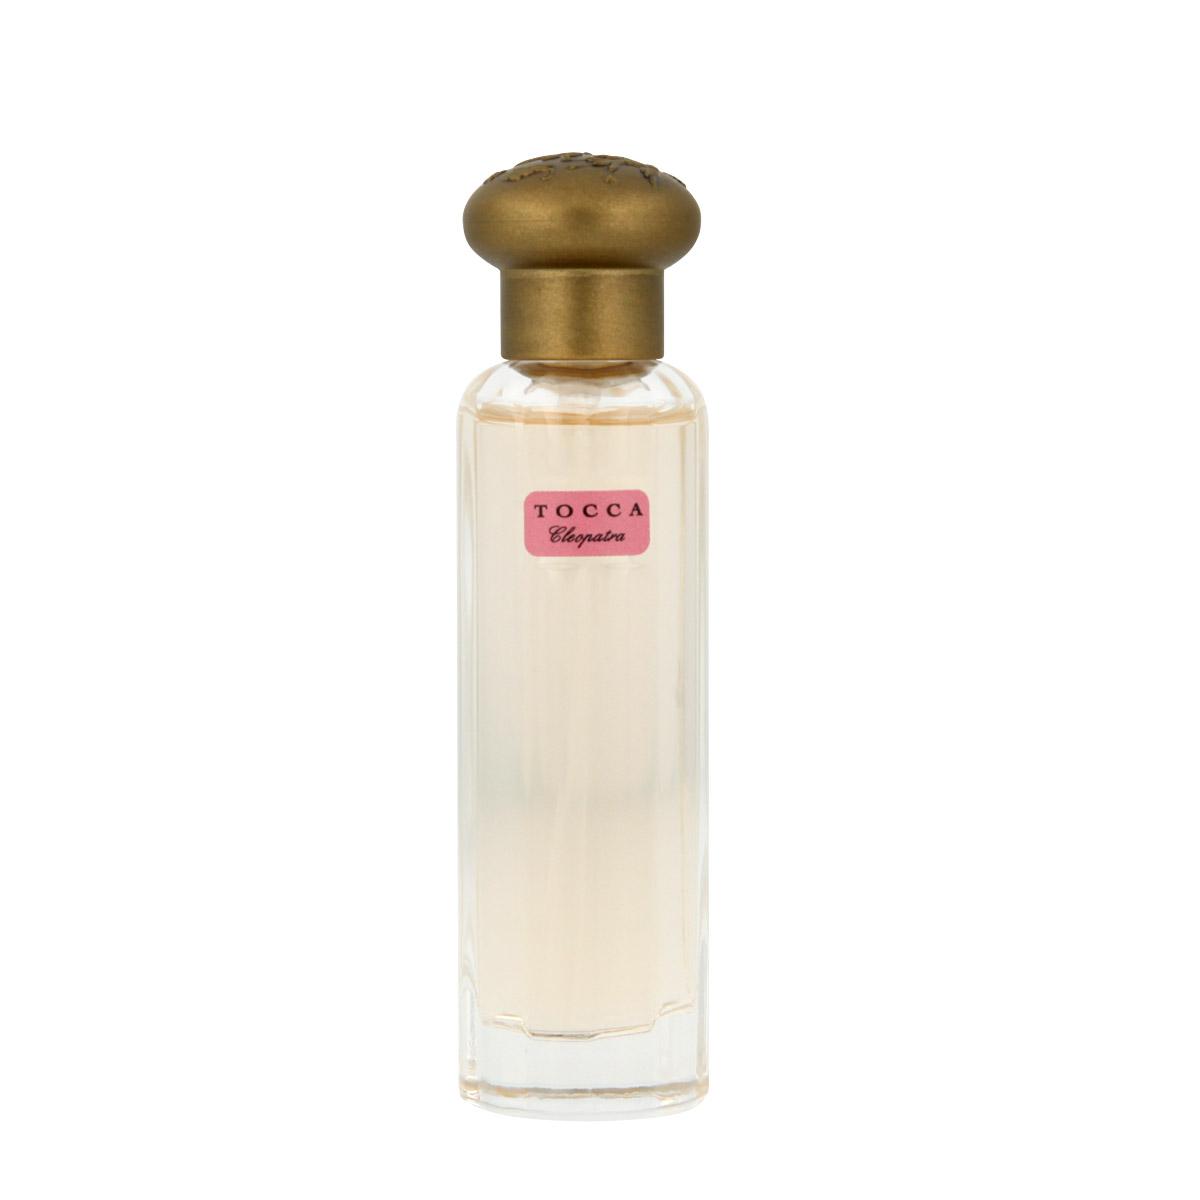 Tocca Cleopatra Eau De Parfum 20 ml (woman) 18077